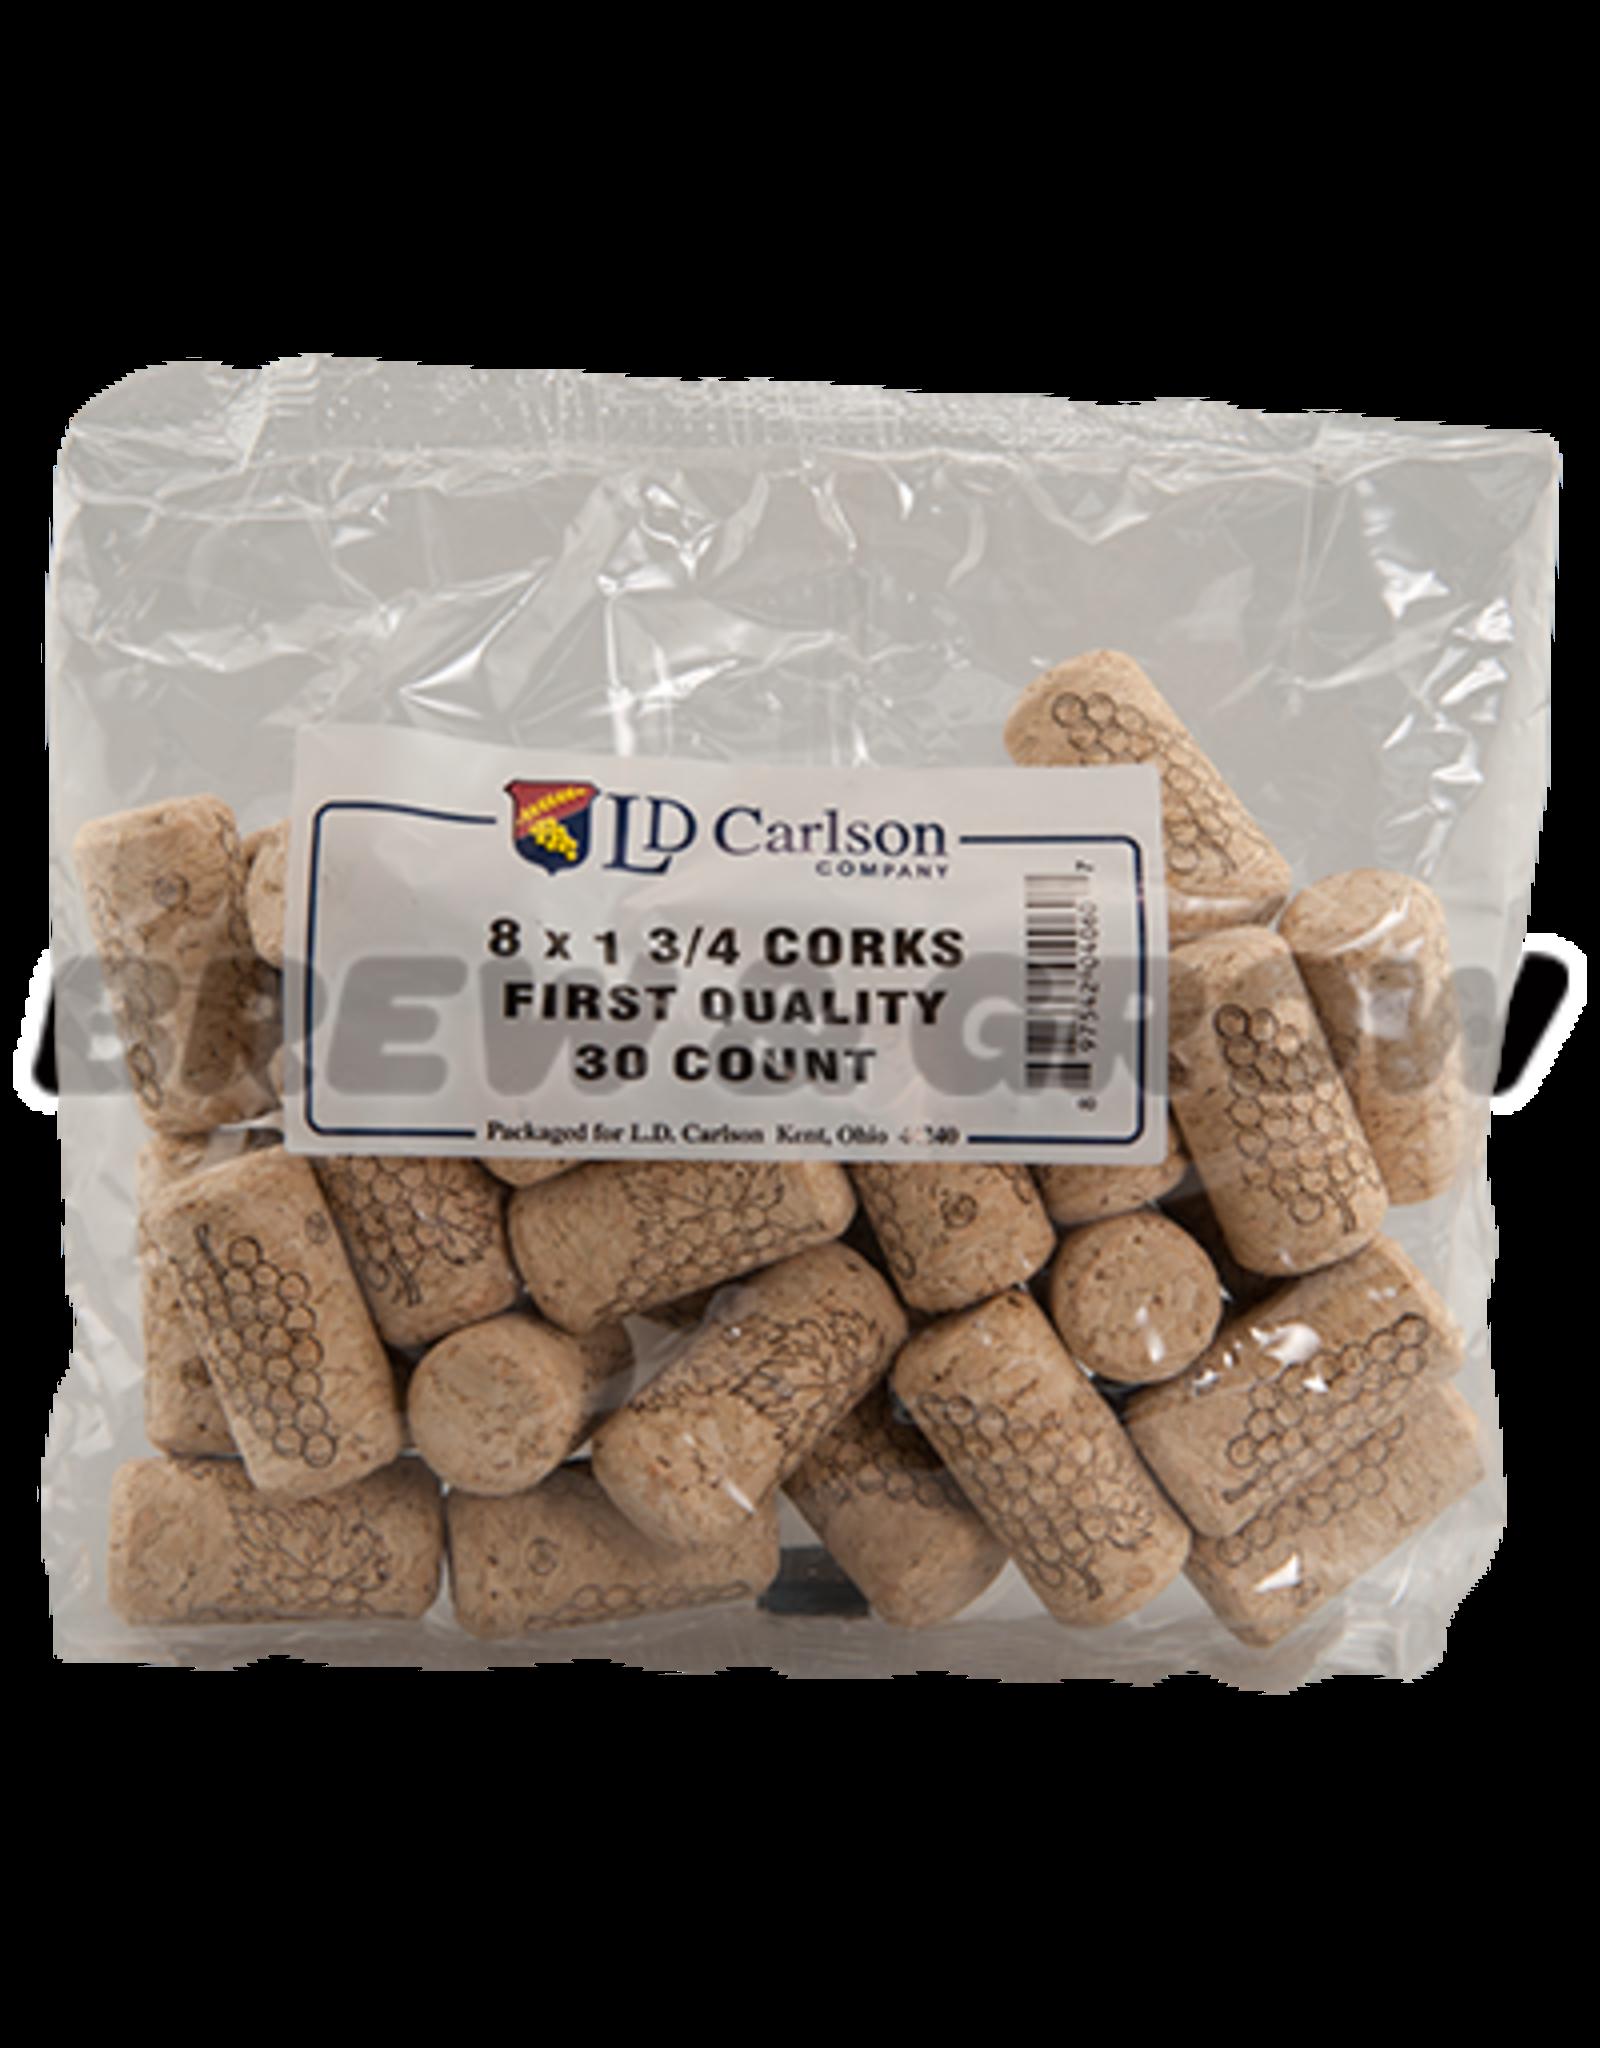 Corks 8 X 1 3/4 (30/Bag)